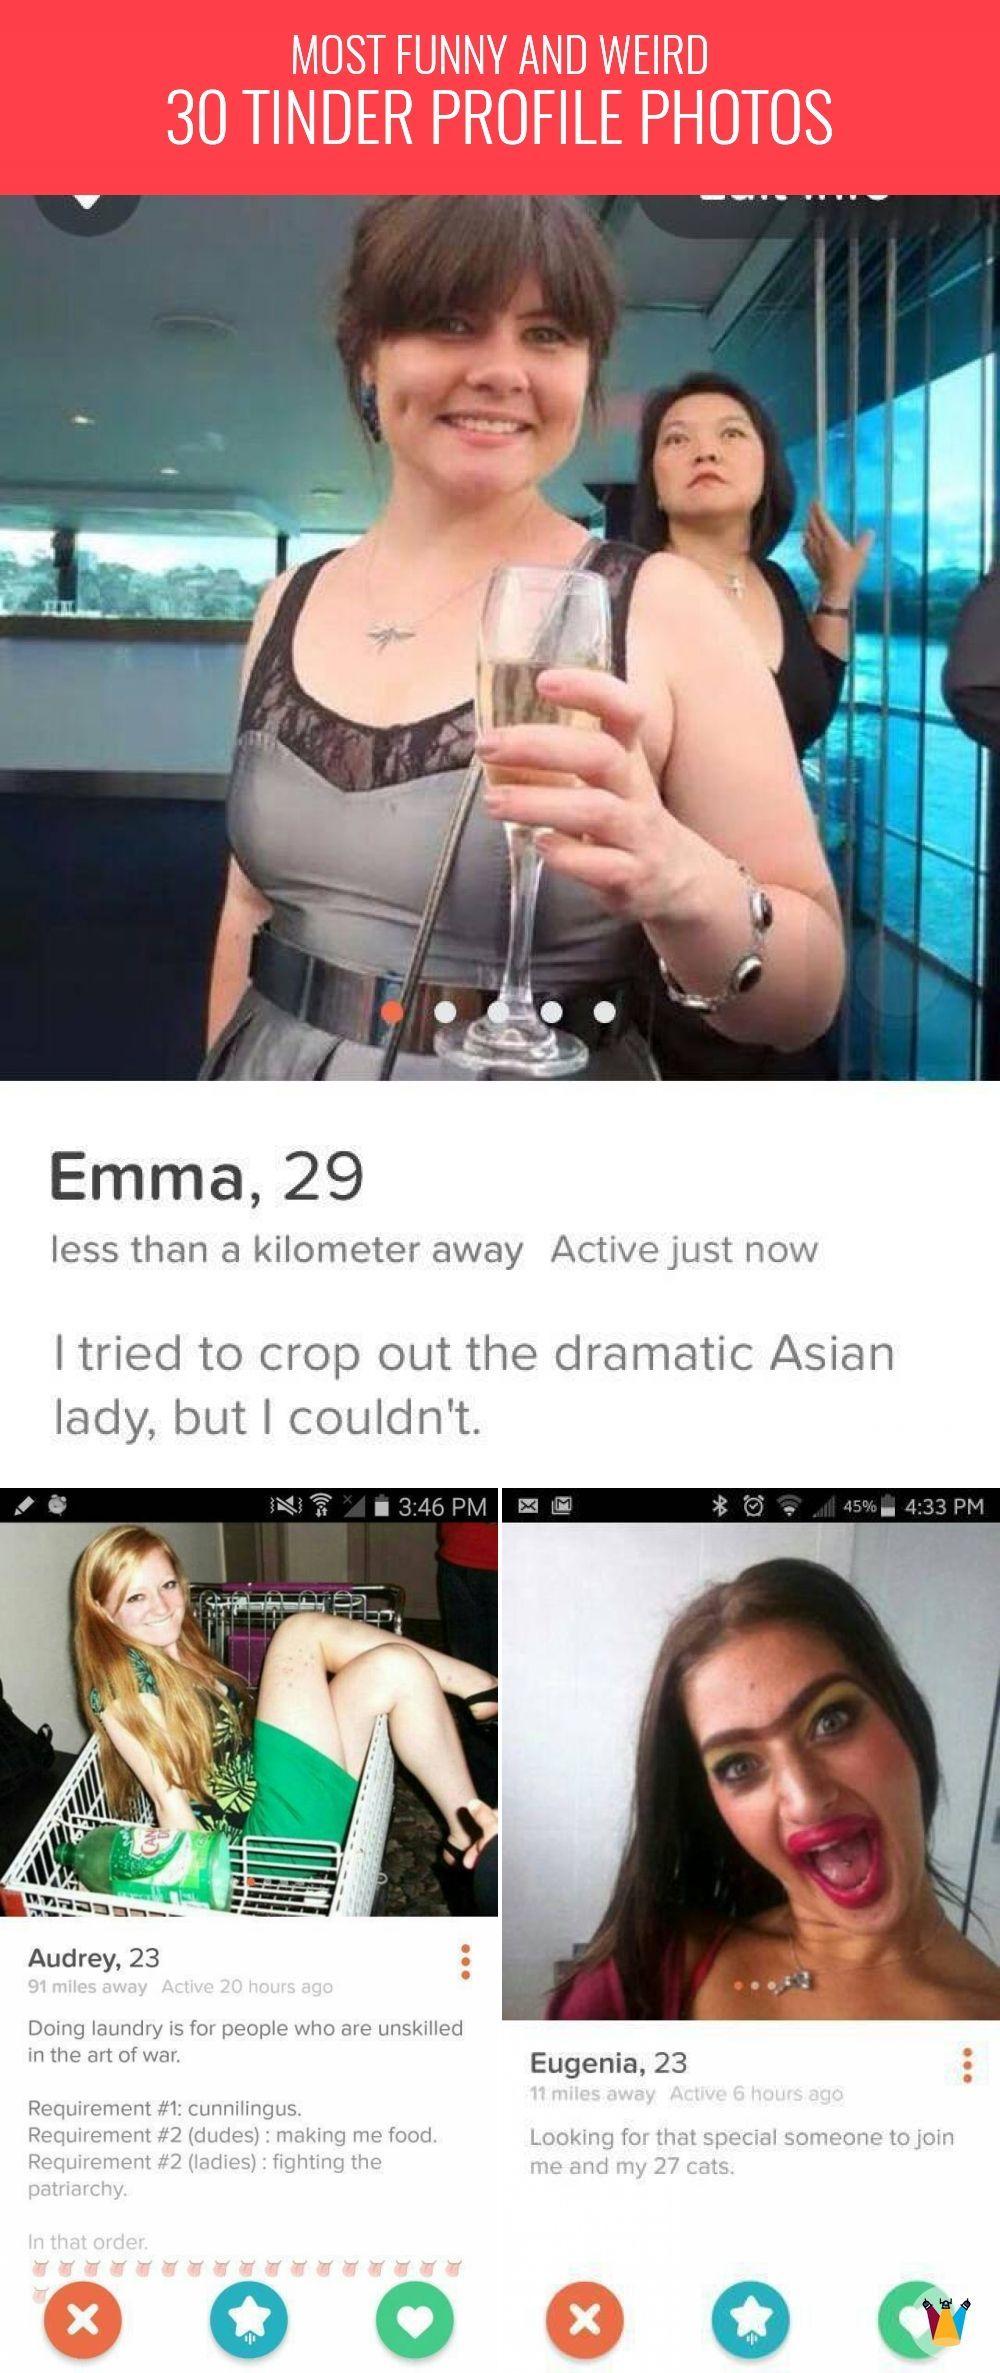 r/dating advice